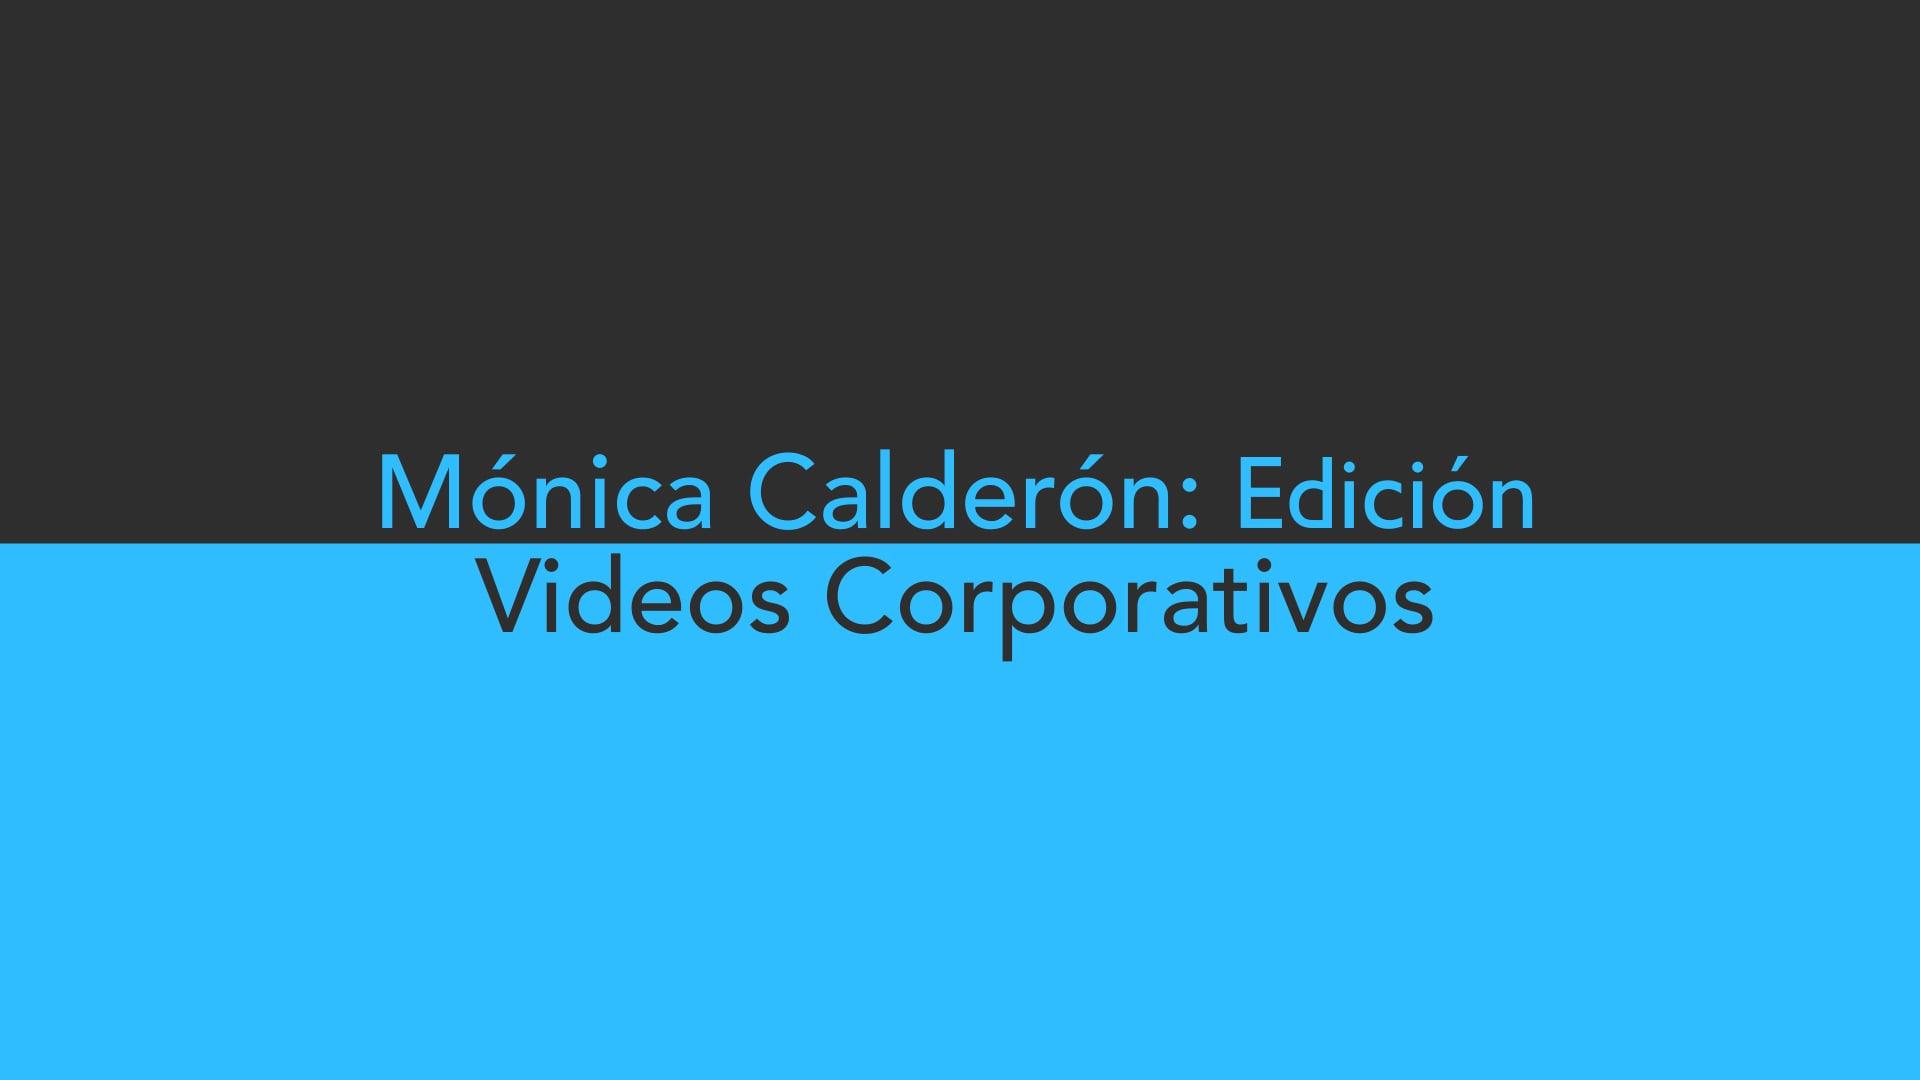 Edit Reel Corporativo/Corporate 2018